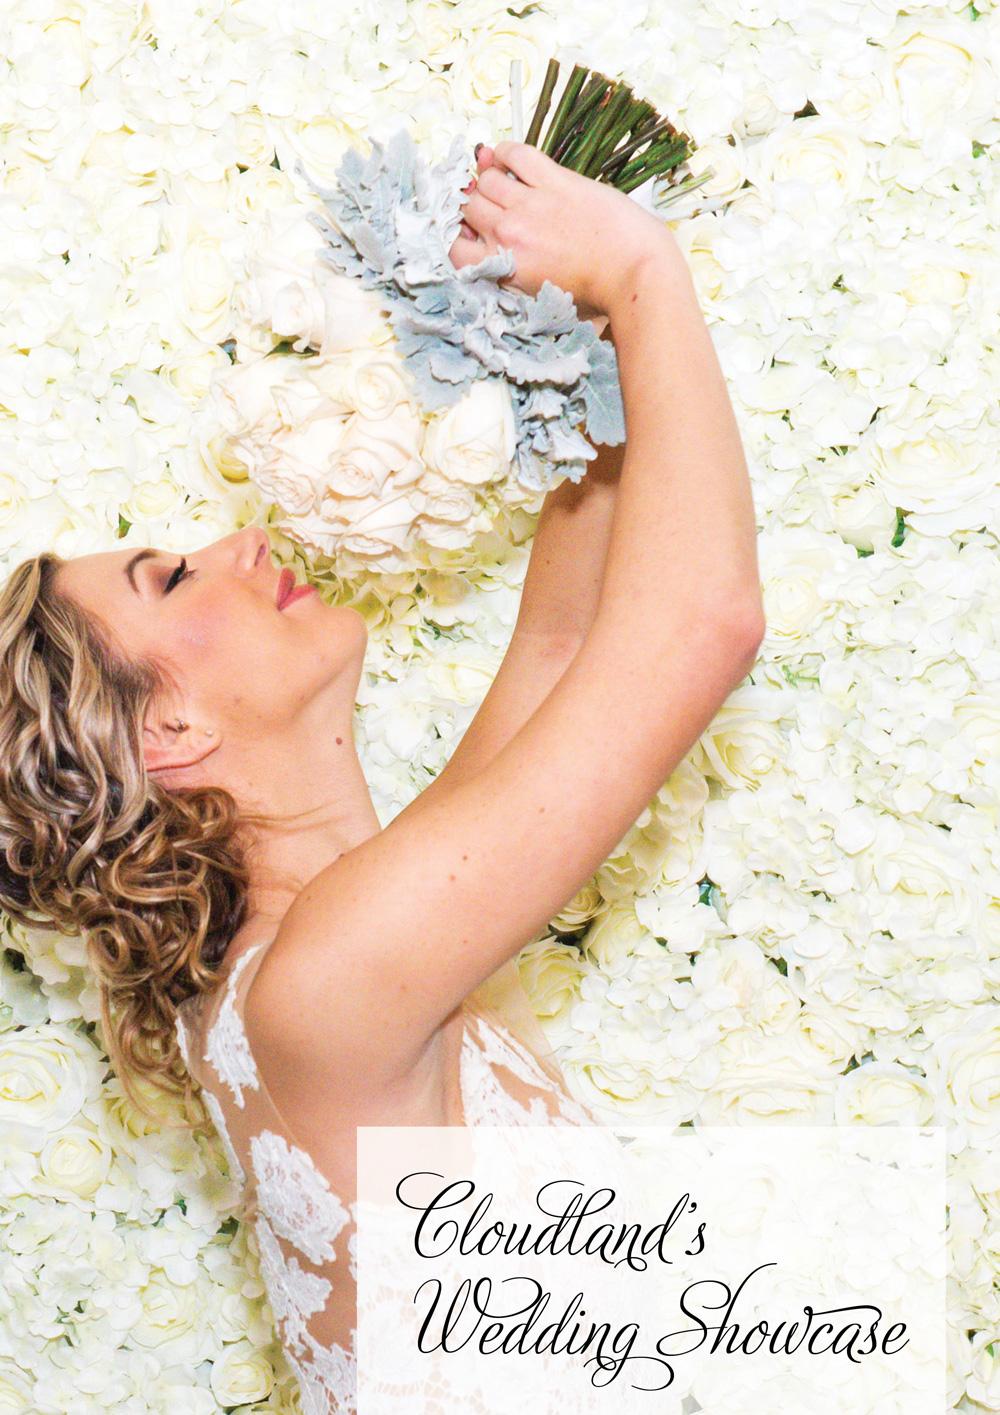 Cloudland Wedding Showcase